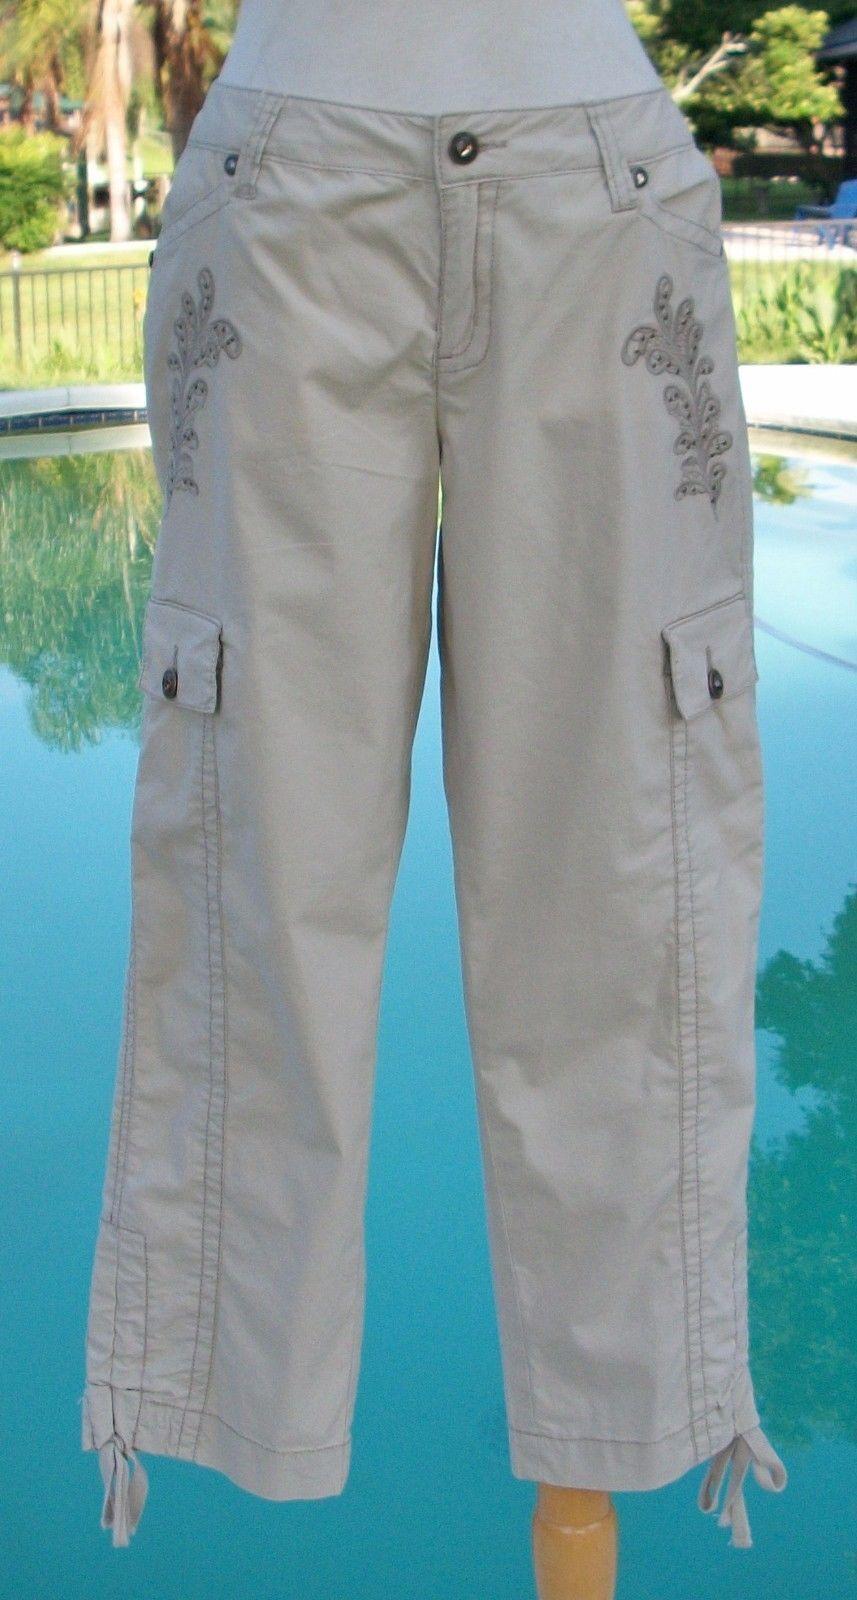 Cache Dressy Crop Pant 0 2 4 XS S Stretch Rhinestone Stud Adjust Length NWT  98